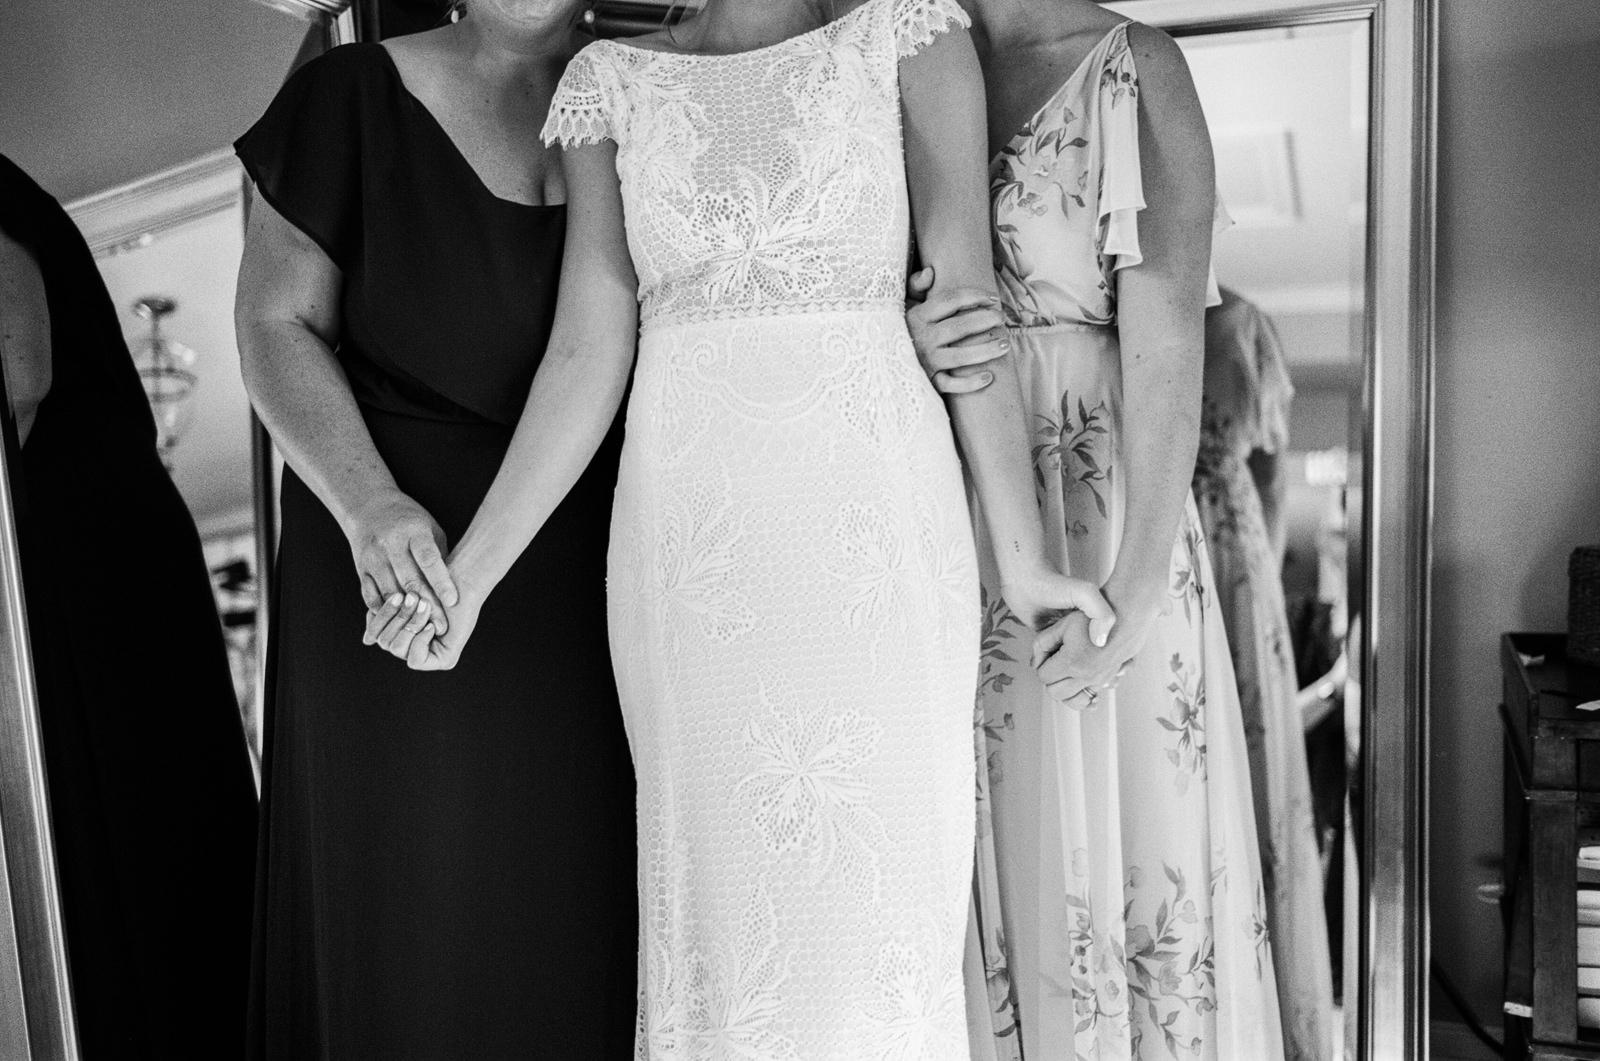 bridgeport-wedding-033 BRIDGEPORT, CONNECTICUT BACKYARD WEDDING